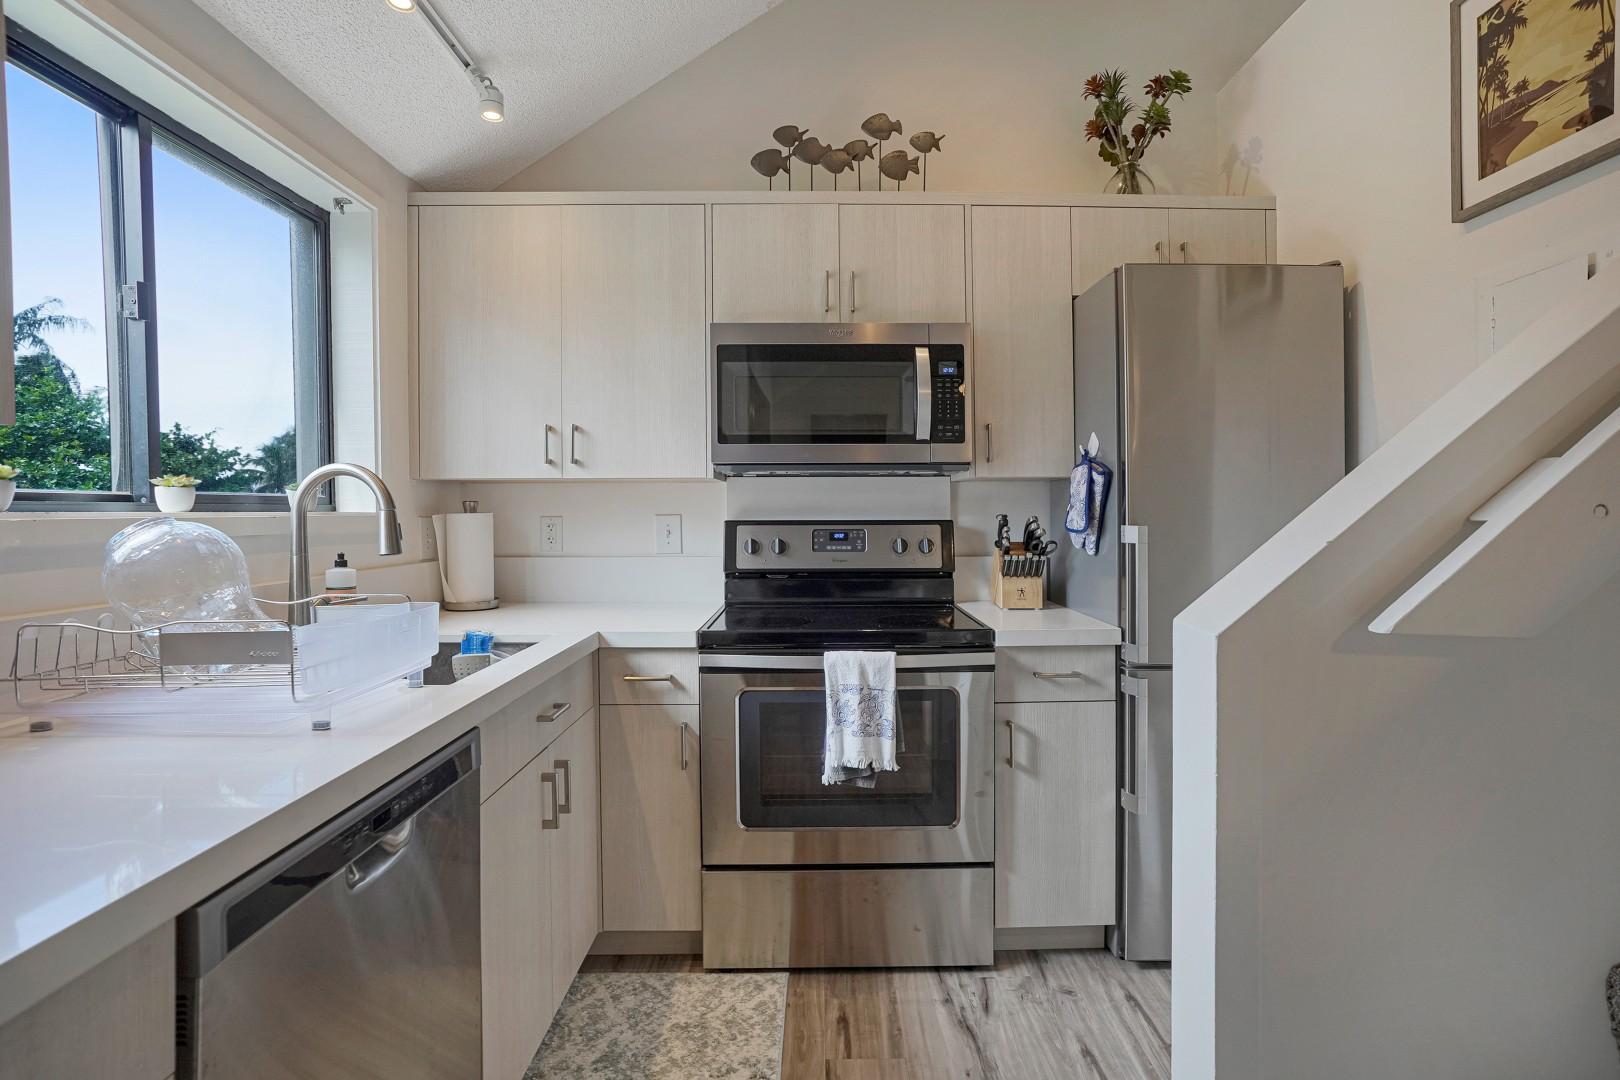 Kitchen with abundant natural light